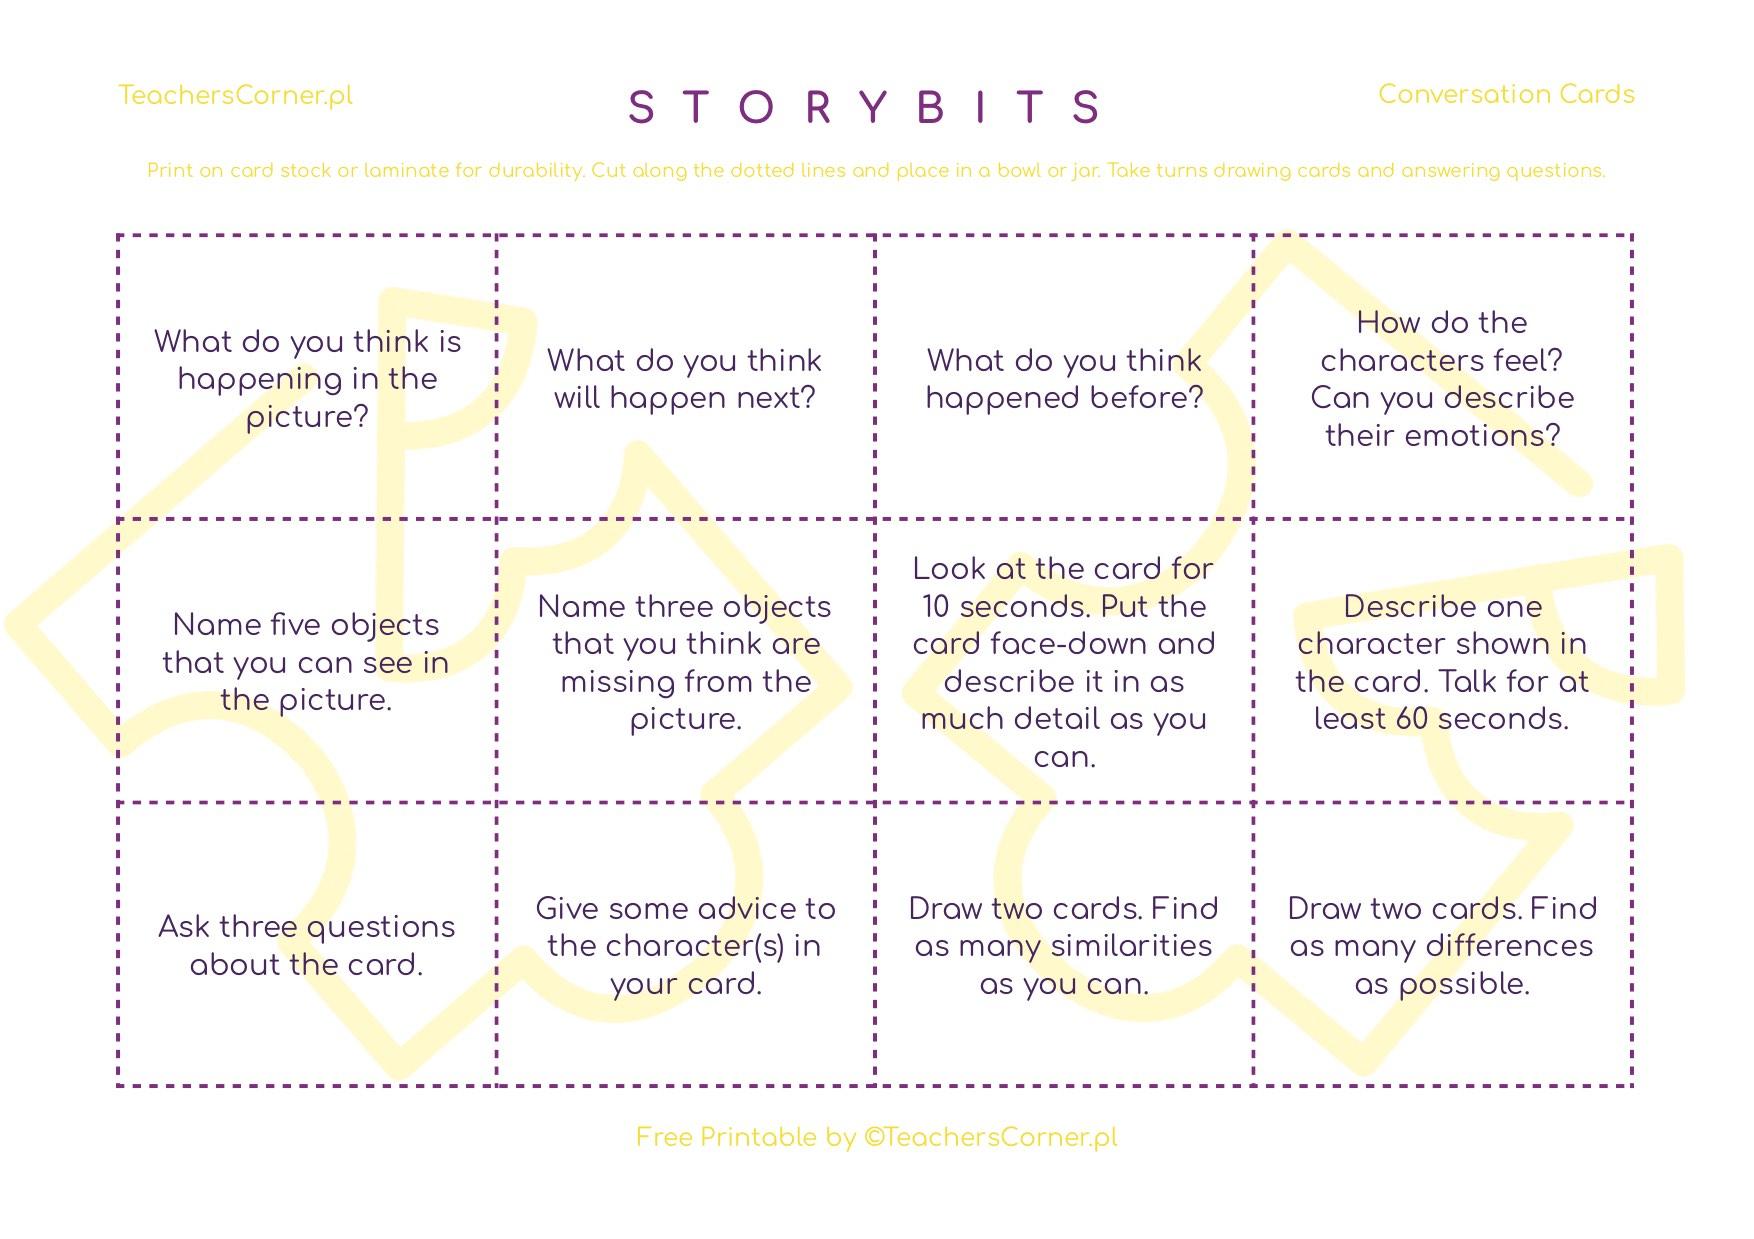 StoryBits Conversation Cards